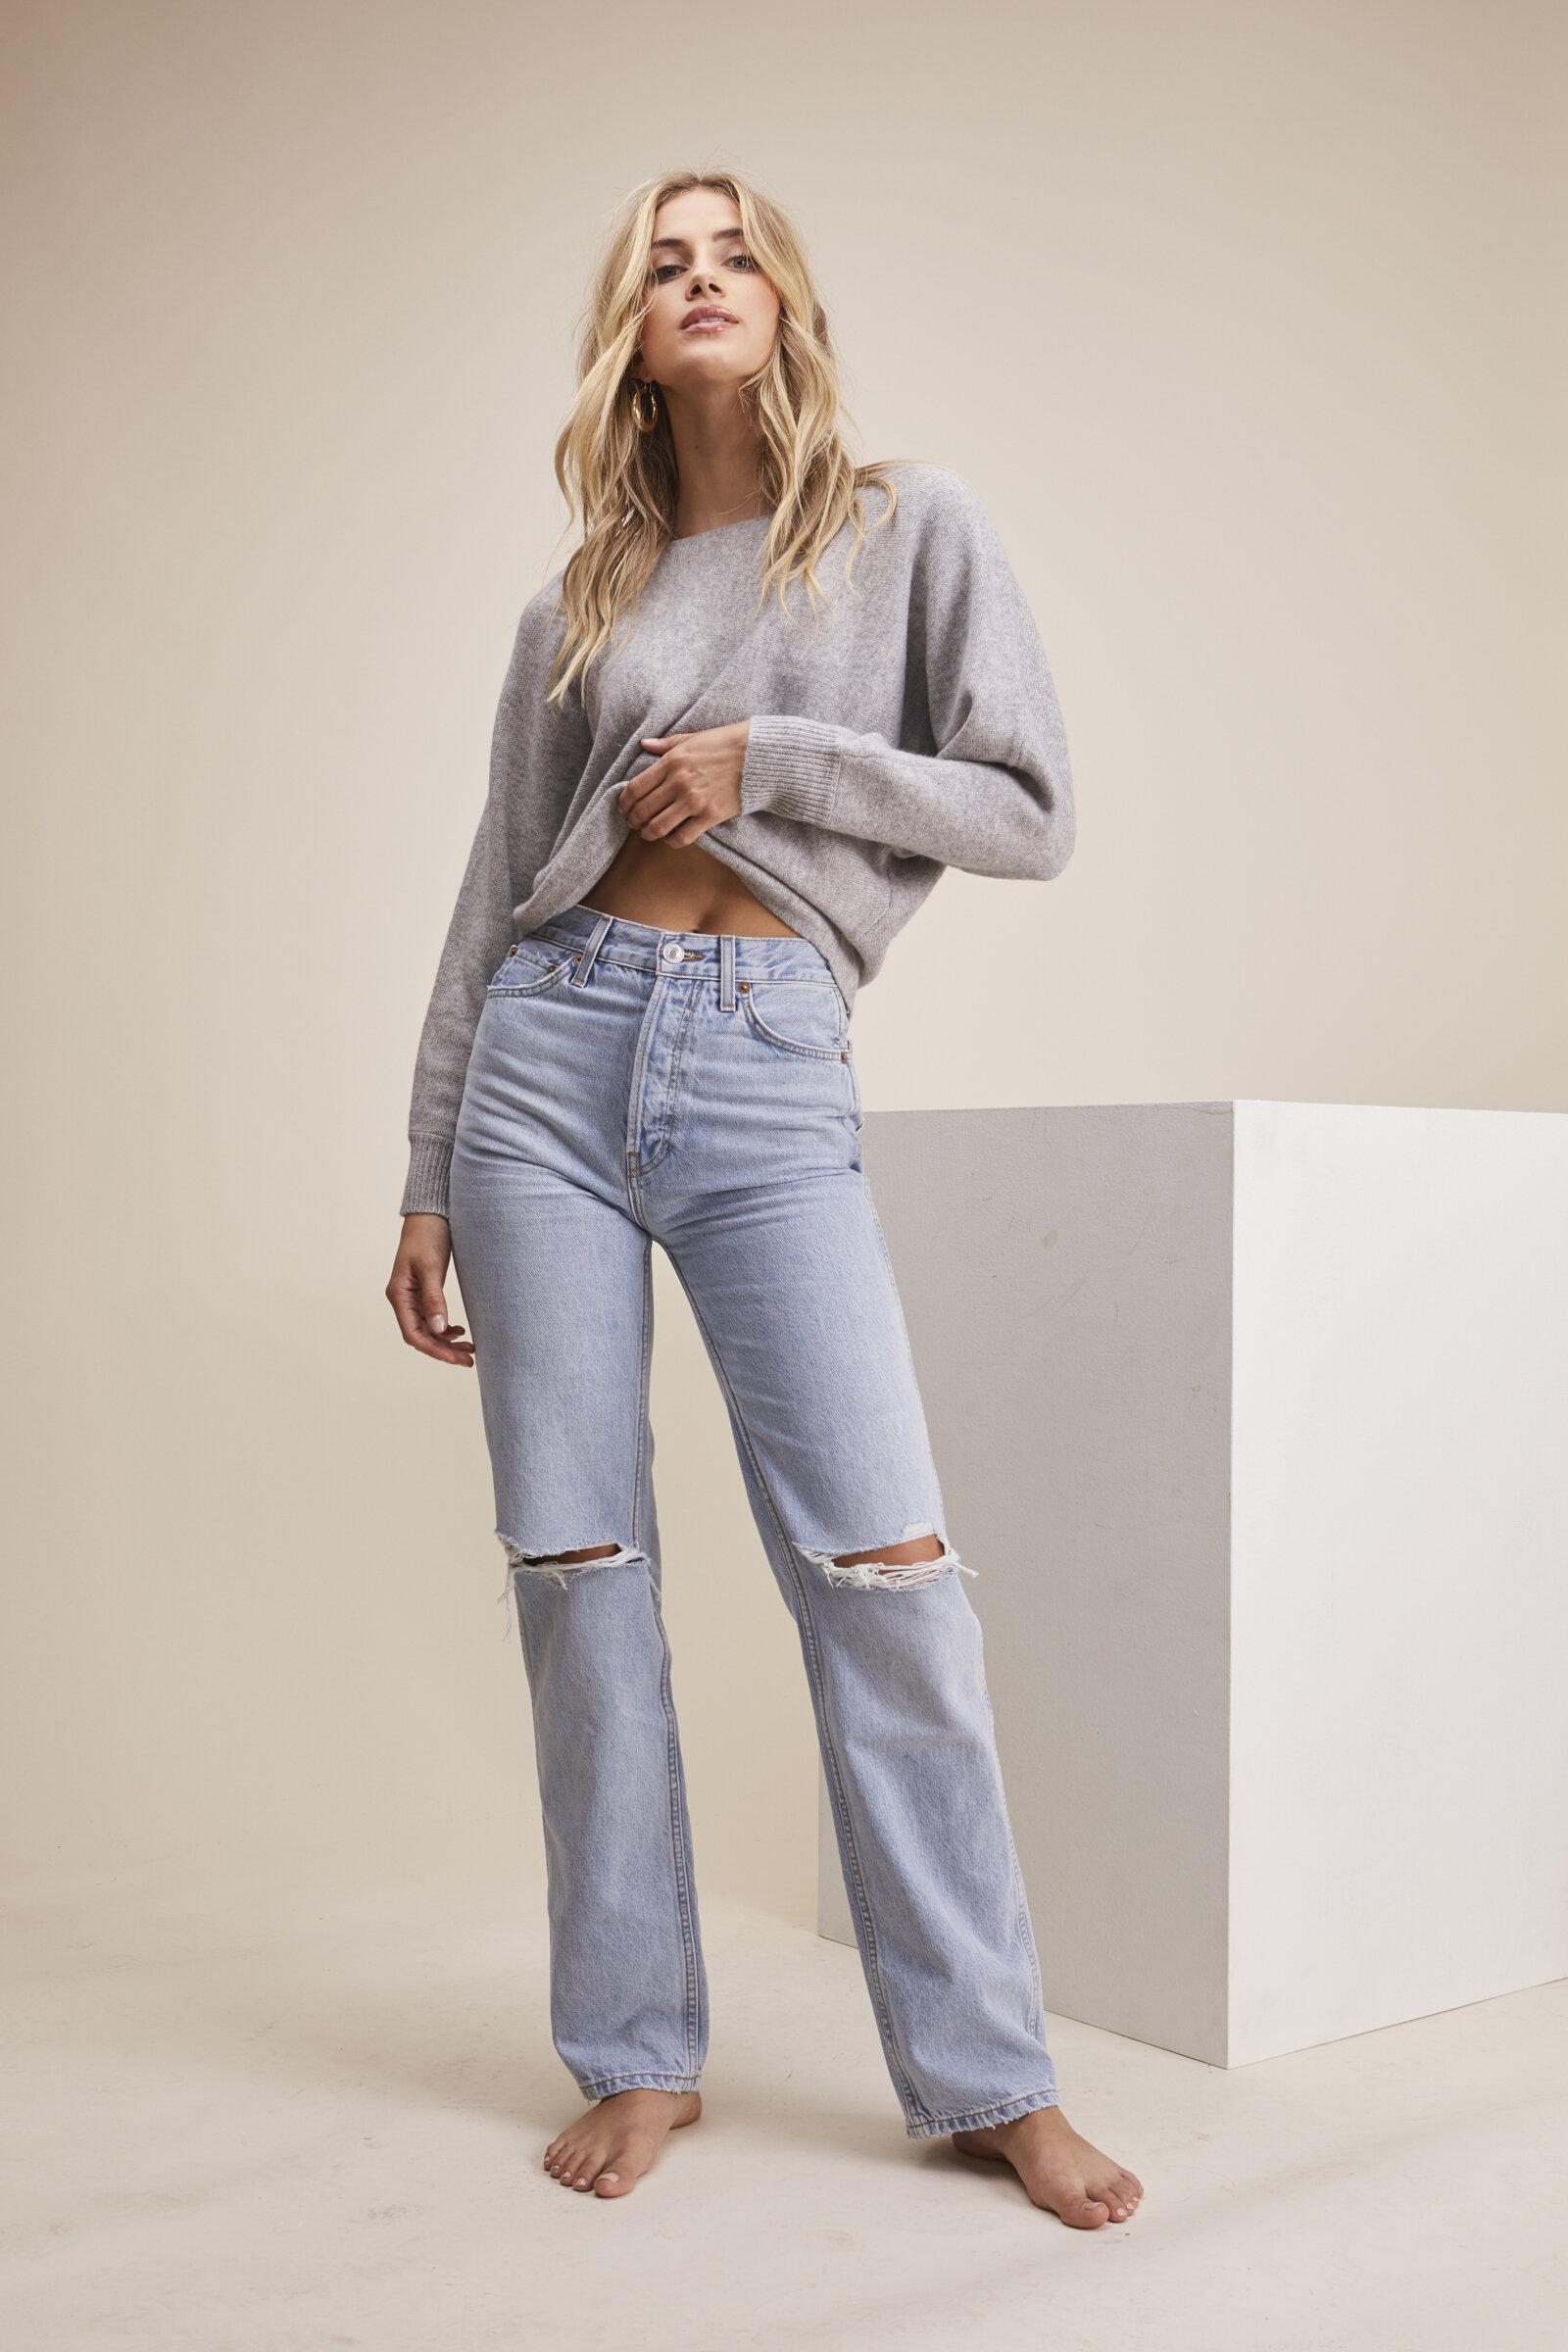 Sweaters_2507.jpg